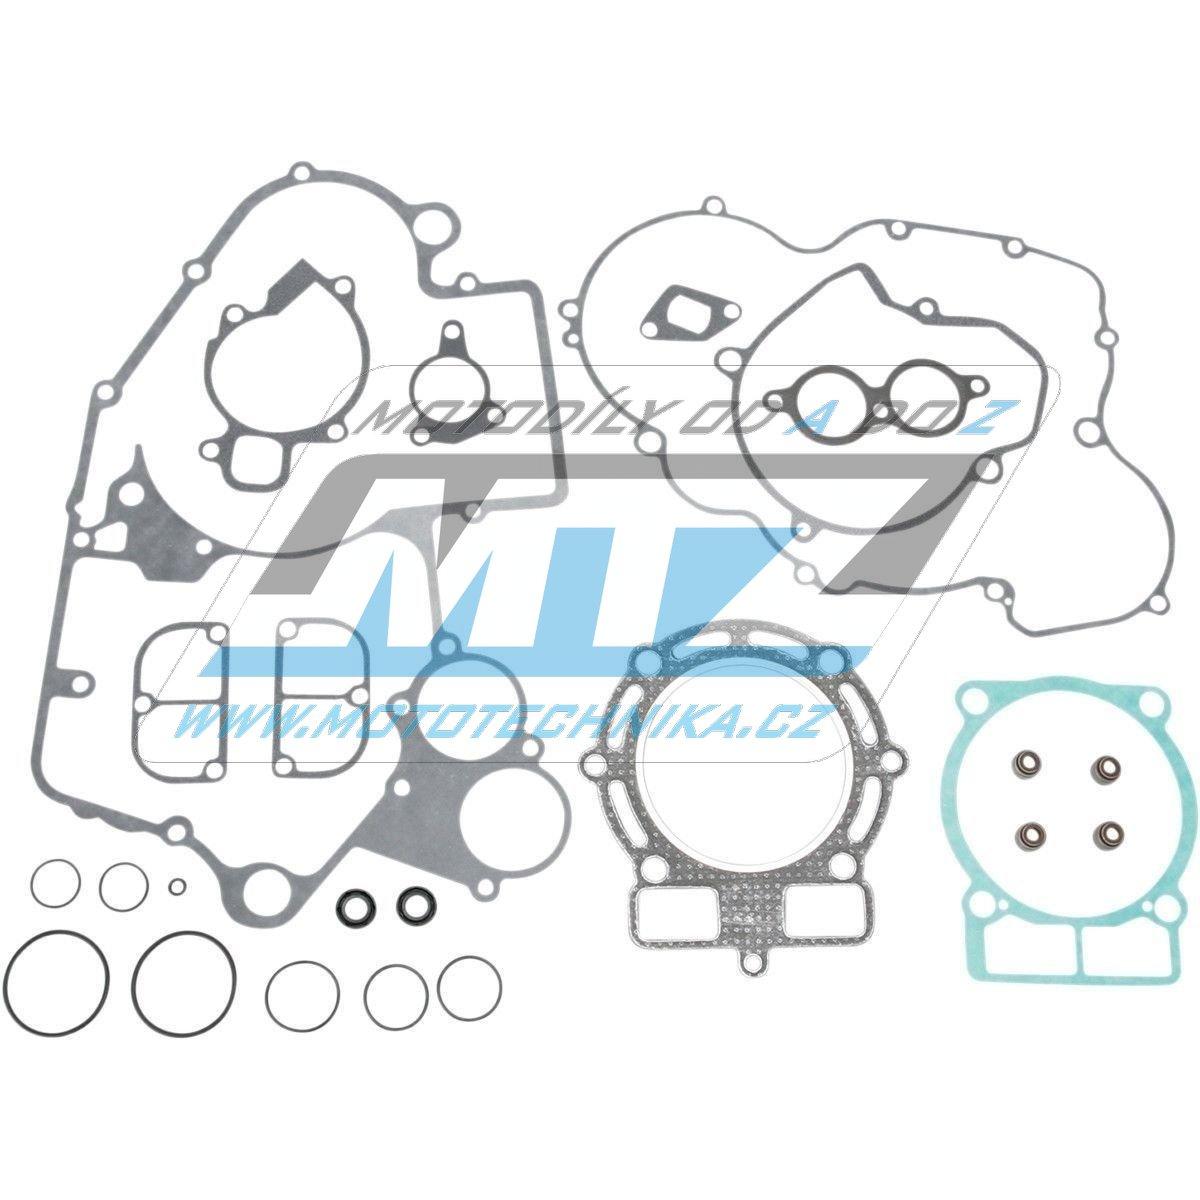 Těsnění kompletní motor KTM400+KTM450 EXC / 00-07 + Beta RR400+Beta450 / 05-09